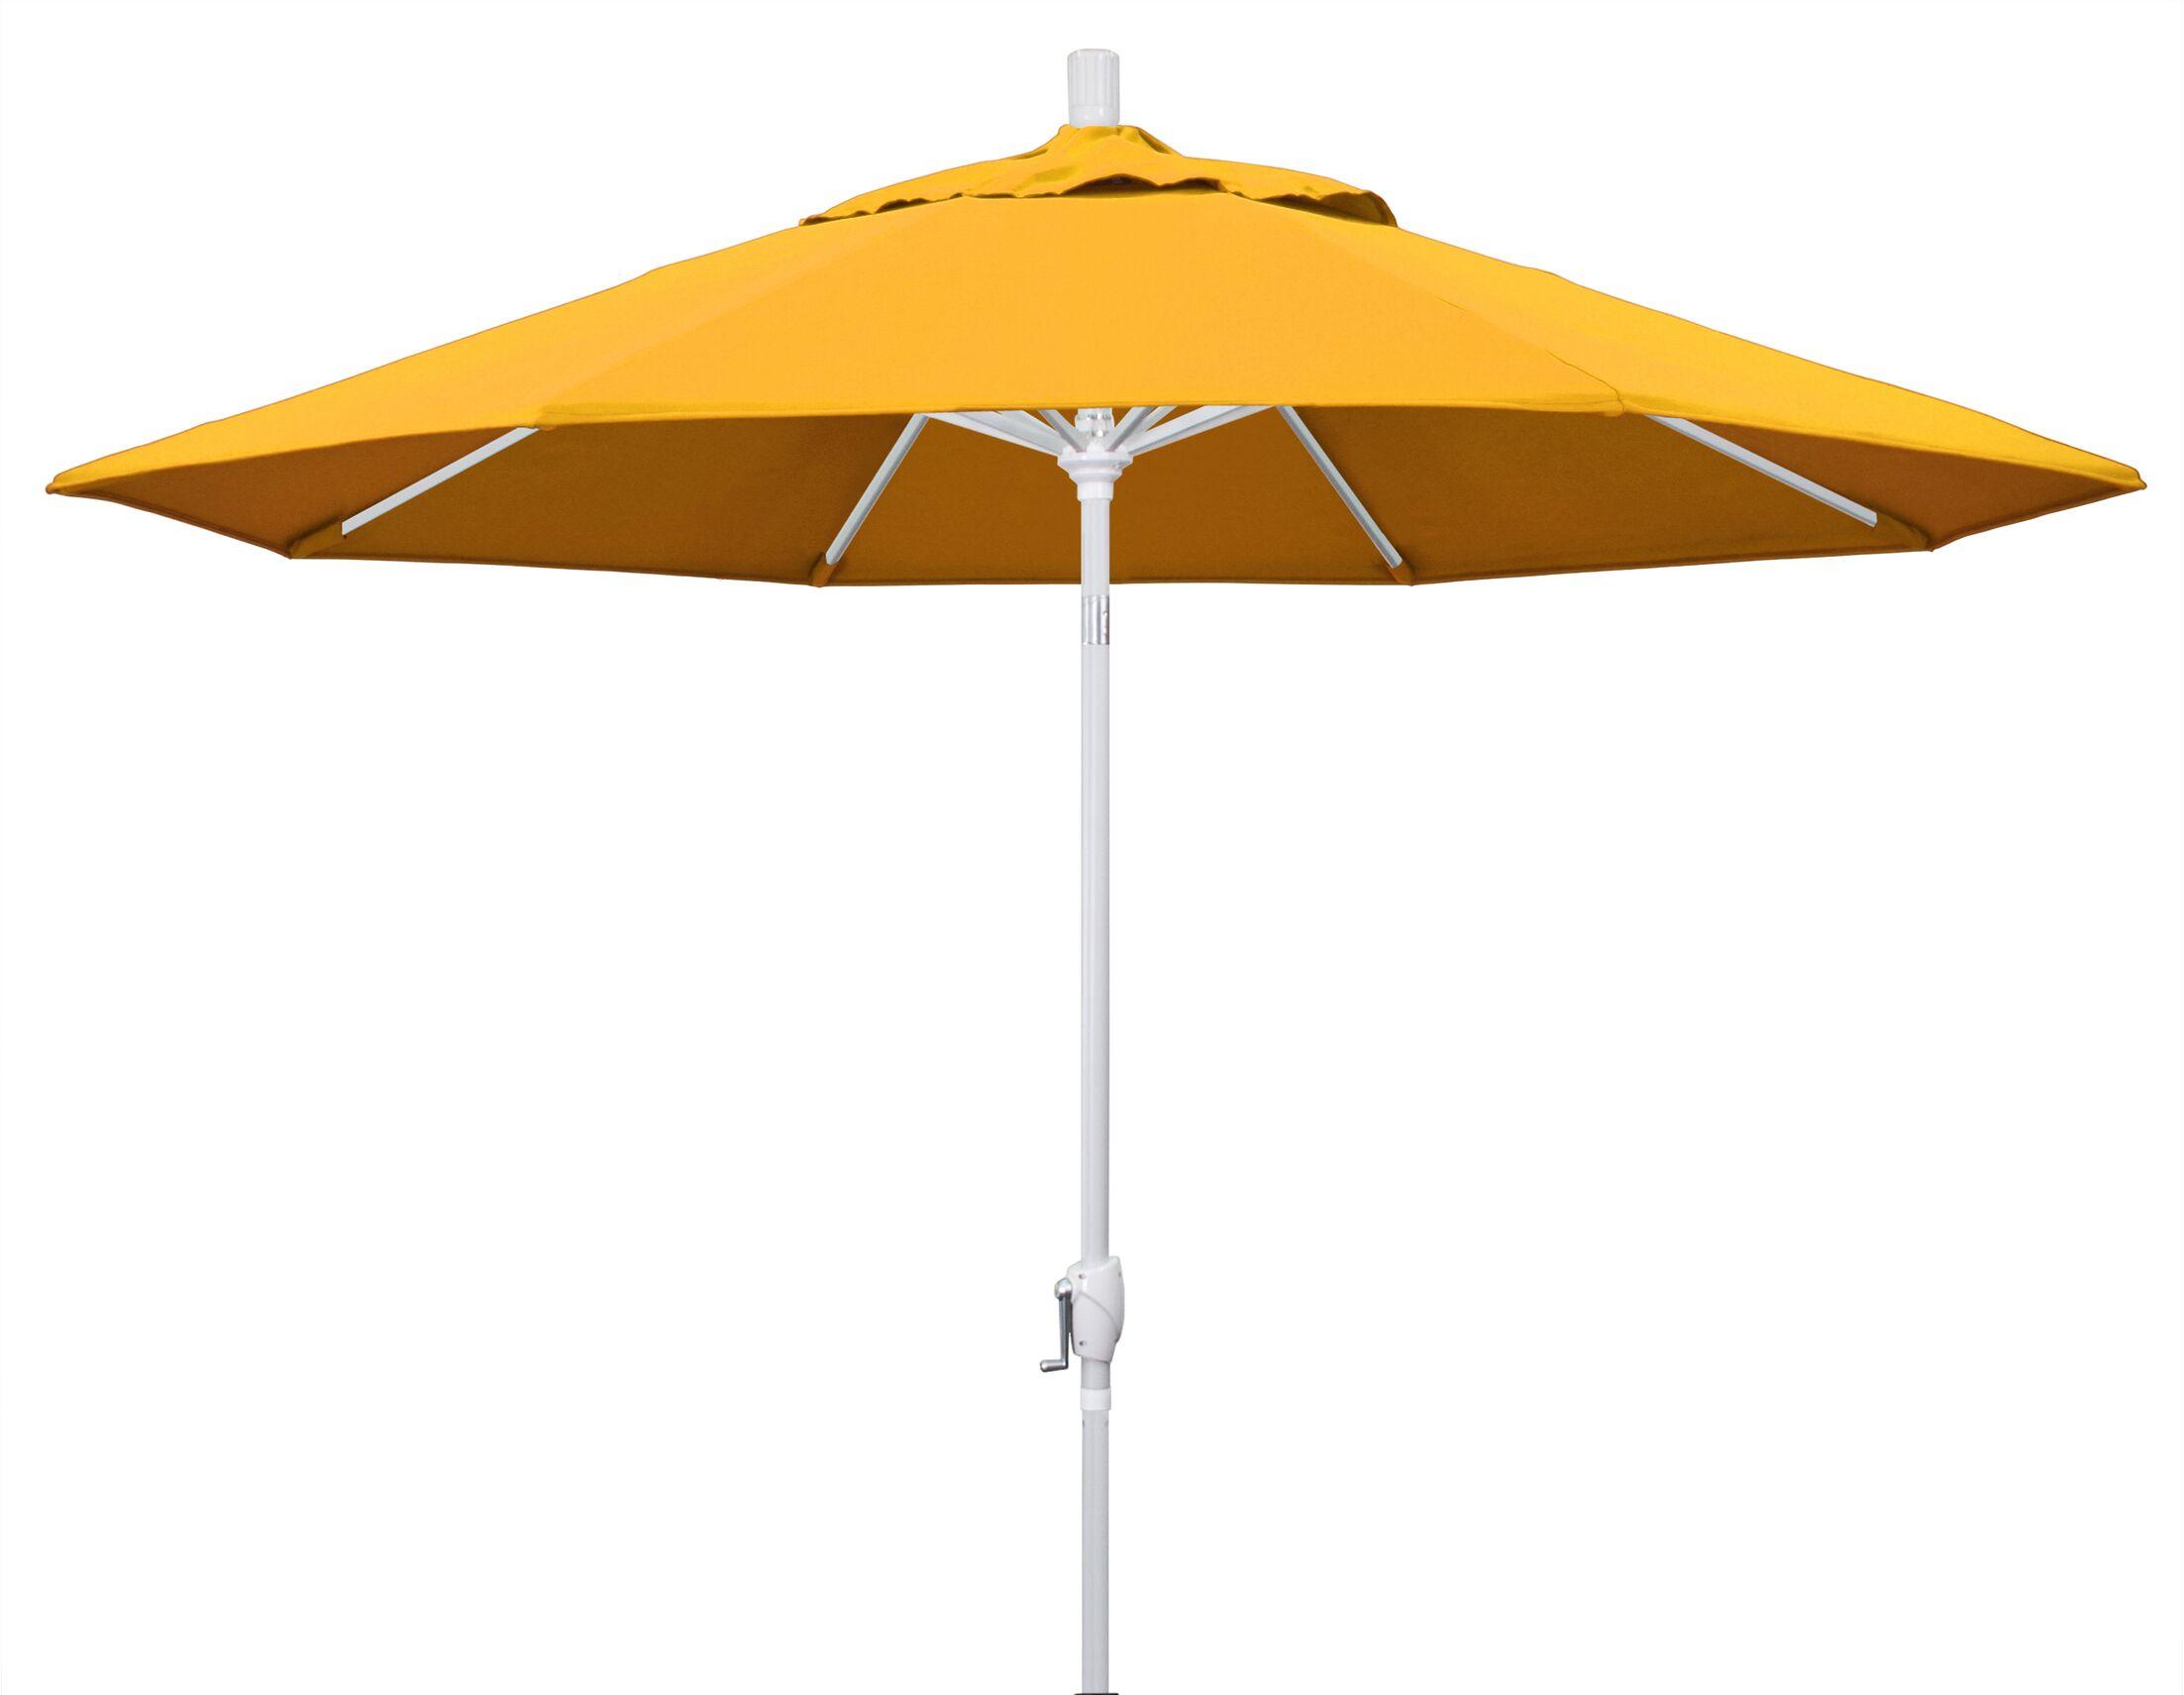 Cello 9' Market Umbrella Fabric: Yellow, Frame Finish: Matted White